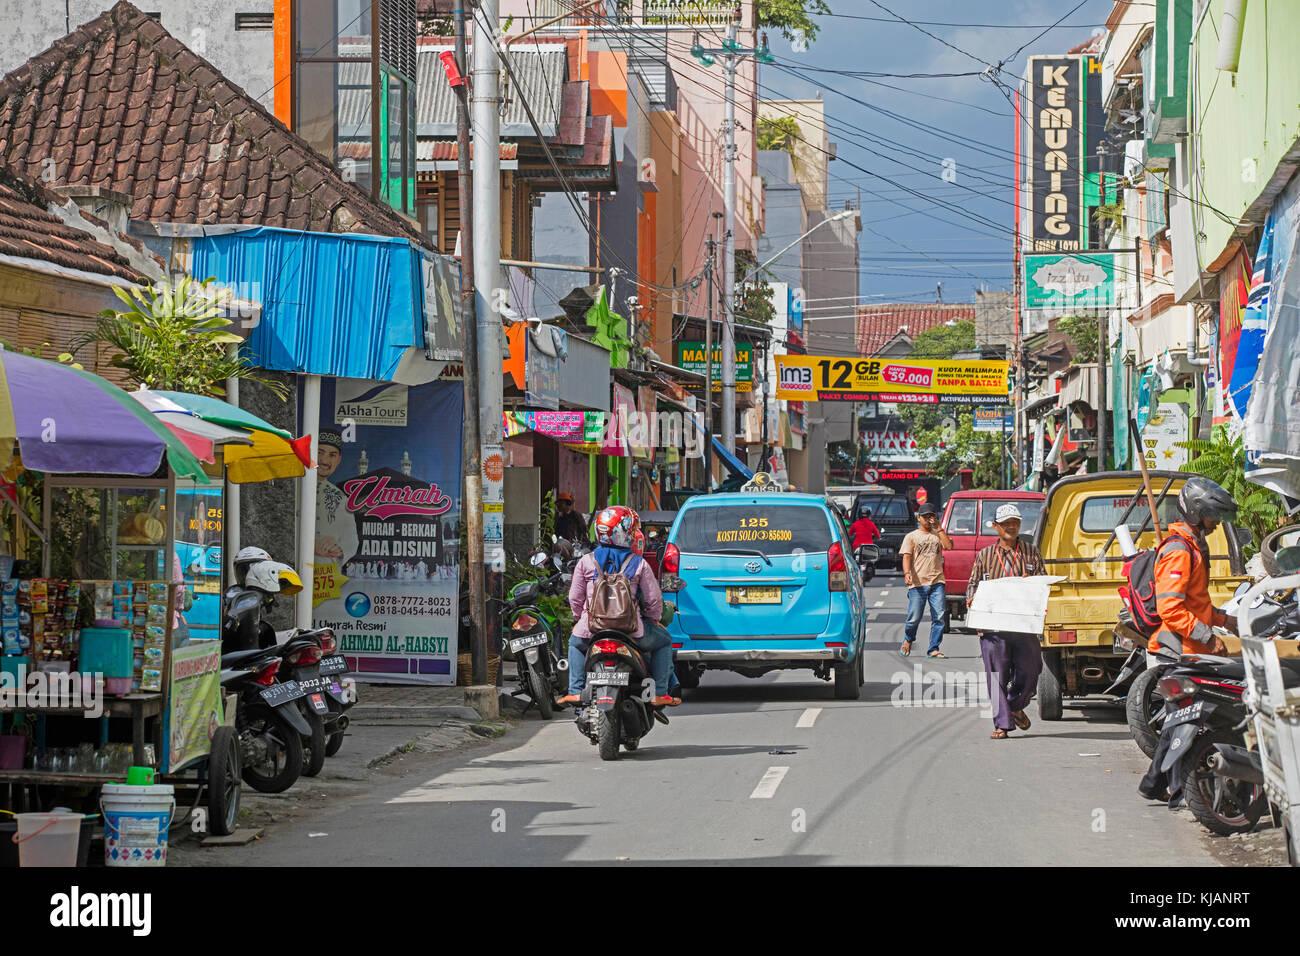 Street scene in the city Surakarta / Solo, Central Java, Indonesia - Stock Image